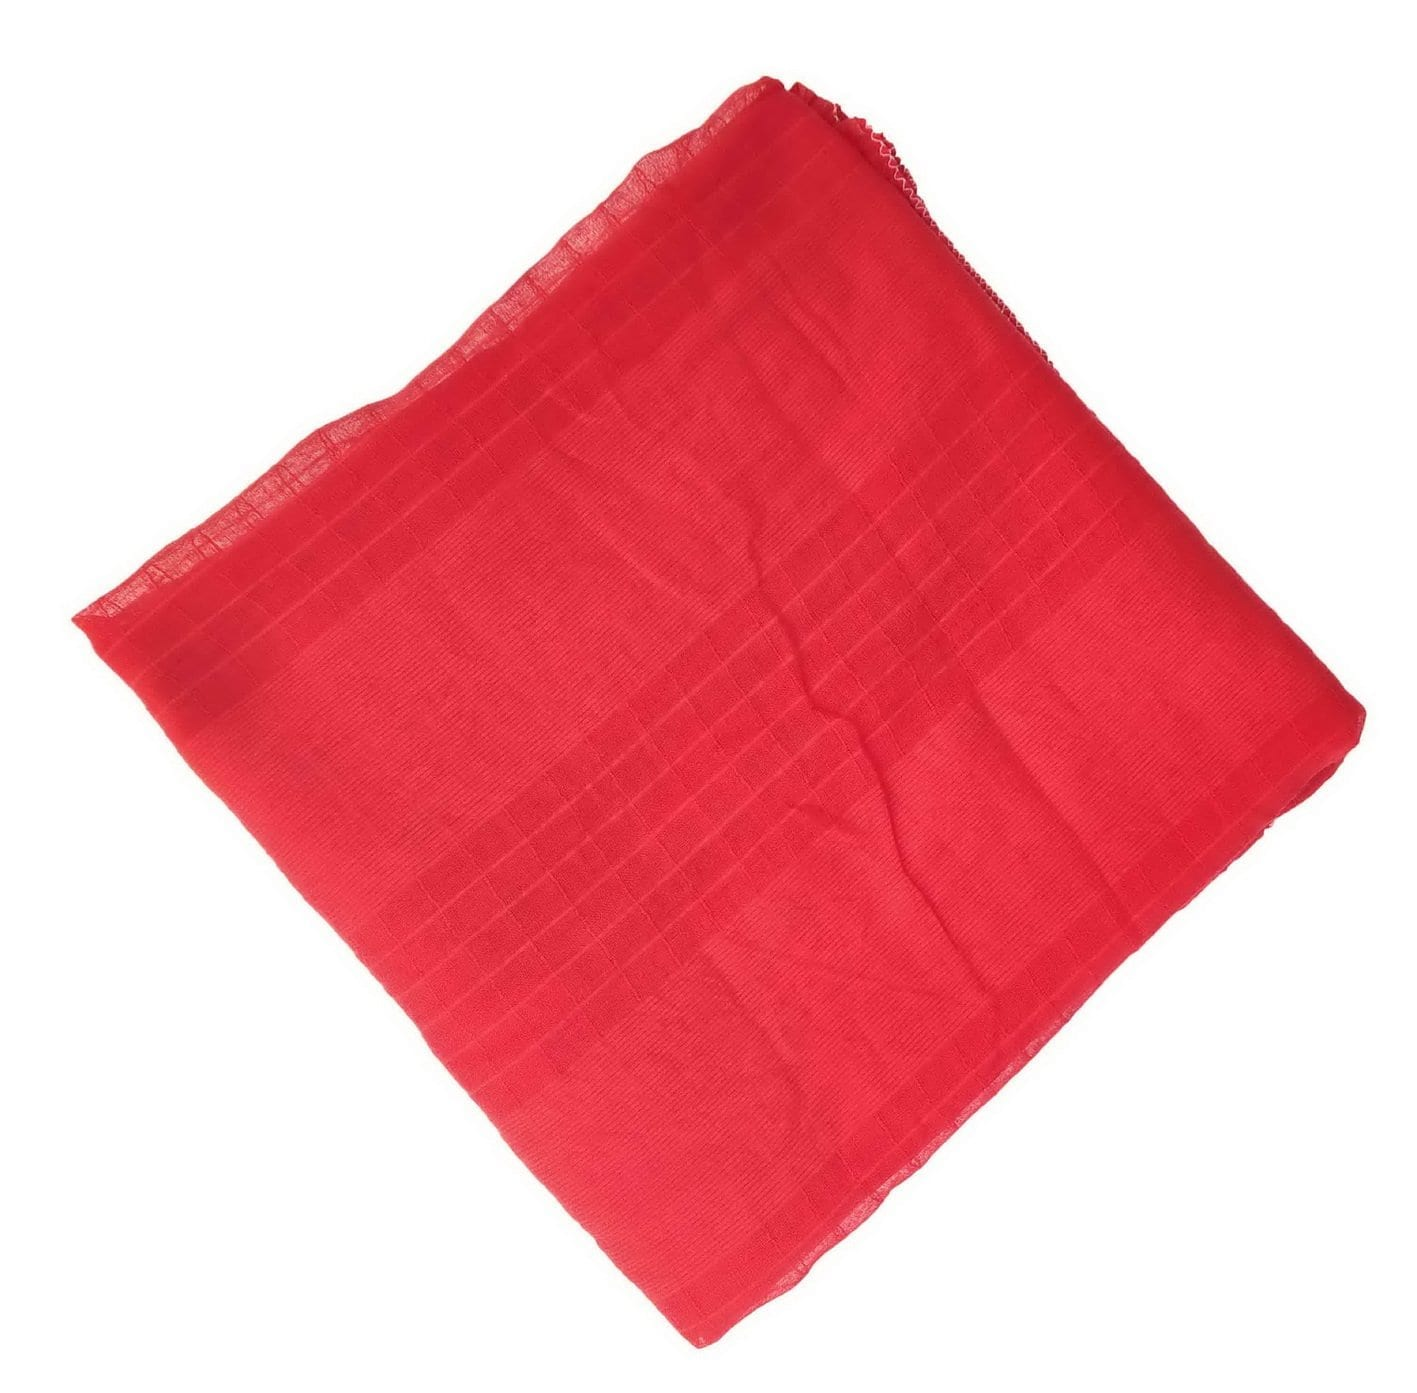 Cotton Doria Dupatta Chunni with self design - All Colours Available 9